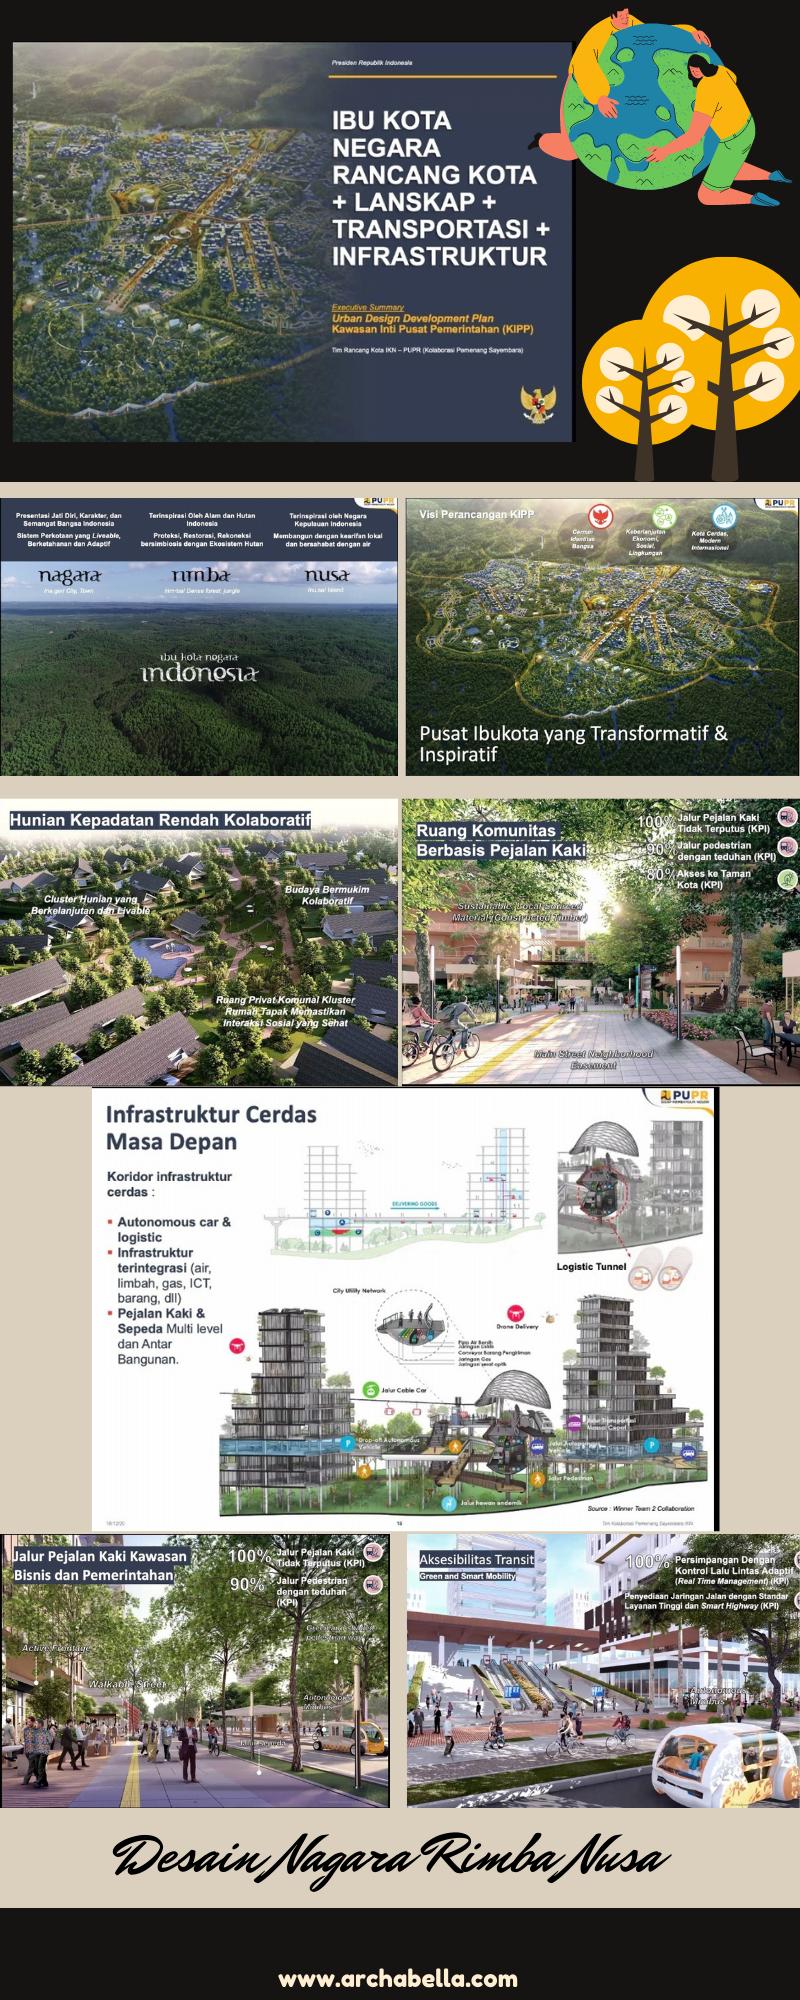 Desain Ibu Kota Negara Indonesia